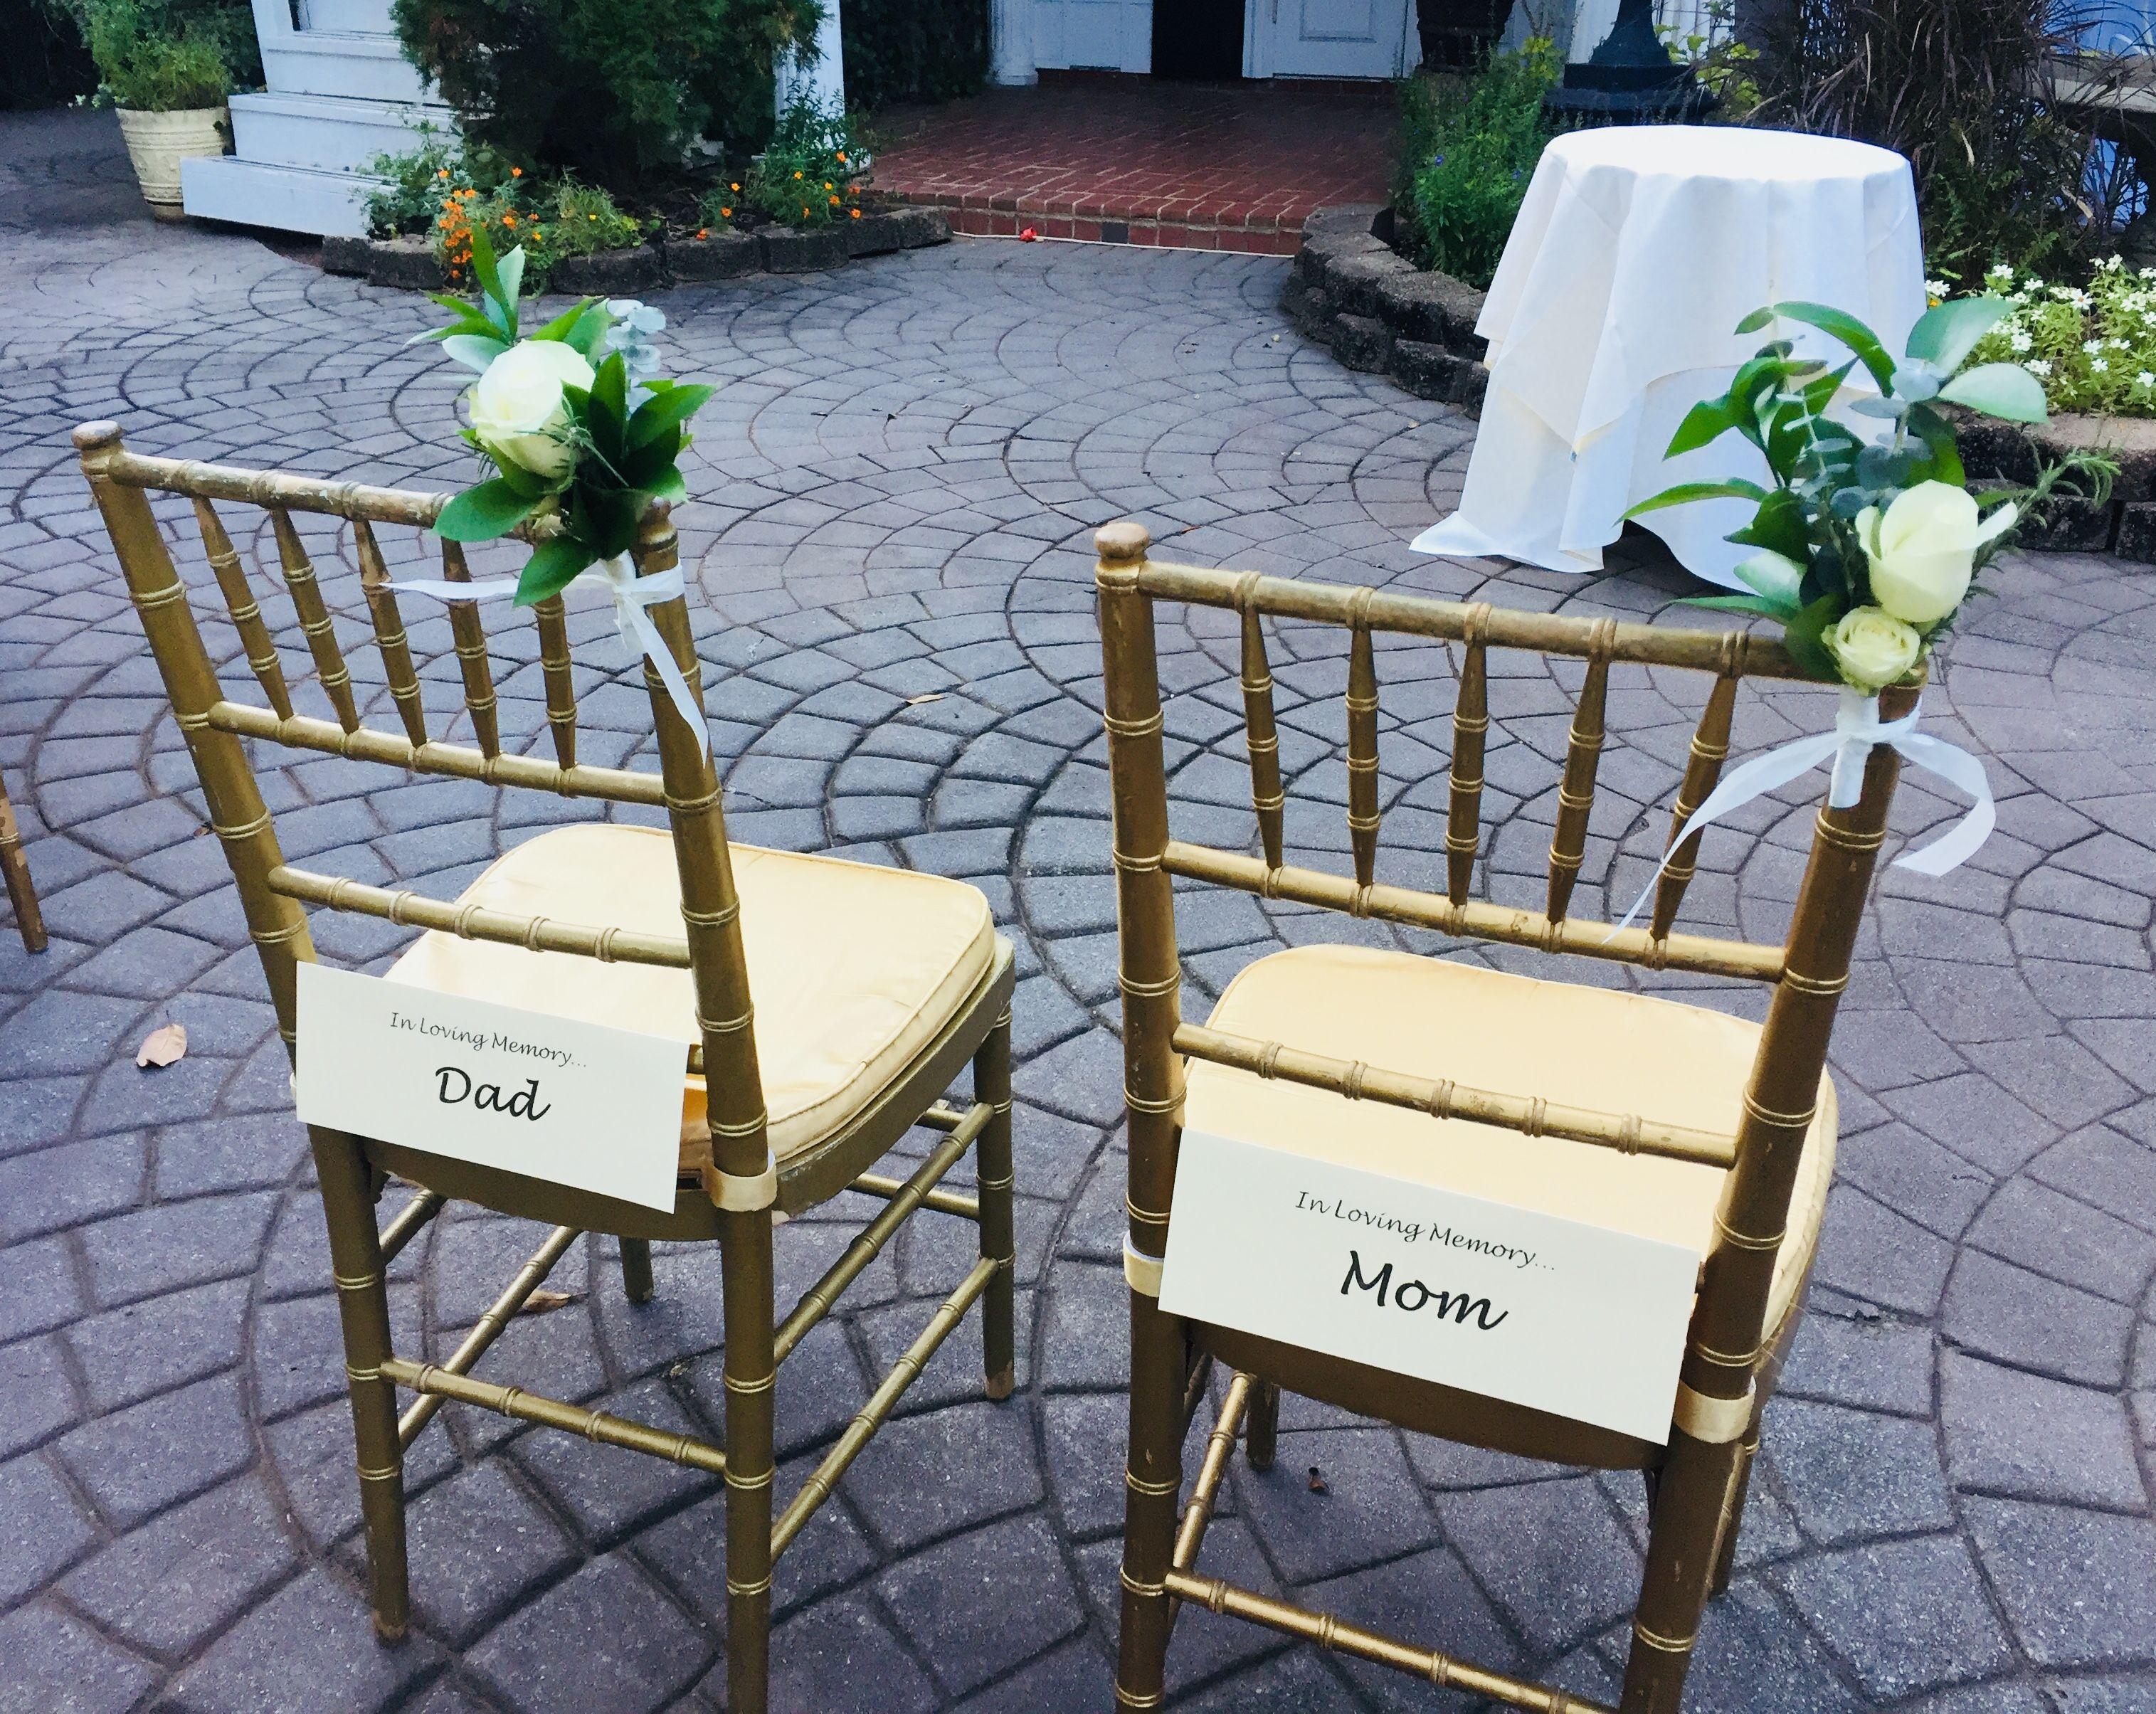 Memory Chairs at wedding | Wedding memorial, Wedding ...